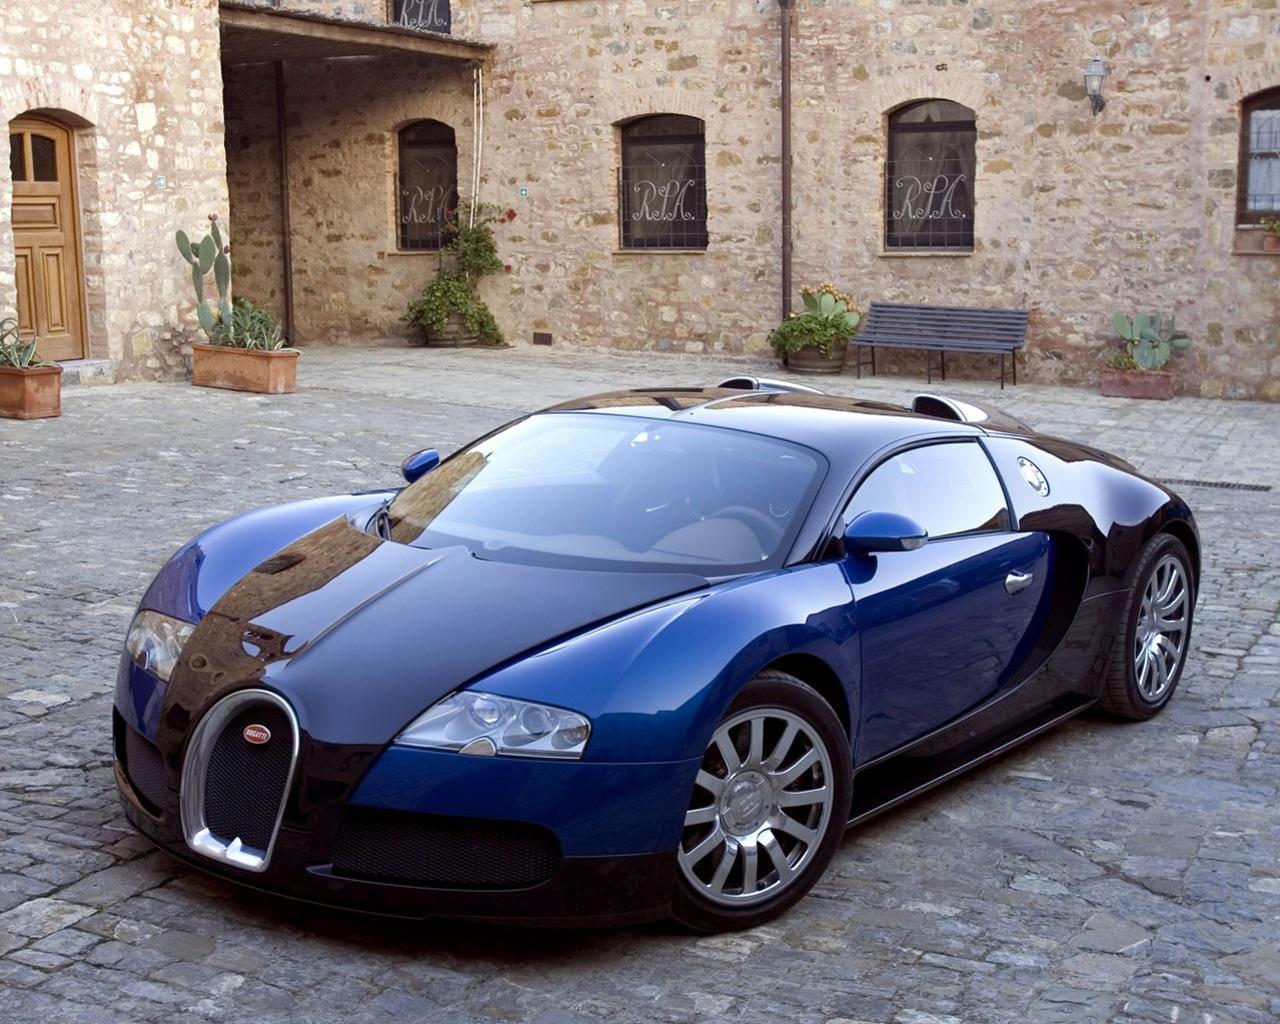 Bugatti Veyron Hd Wallpaper - Bugatti Veyron 16.4 2013 , HD Wallpaper & Backgrounds